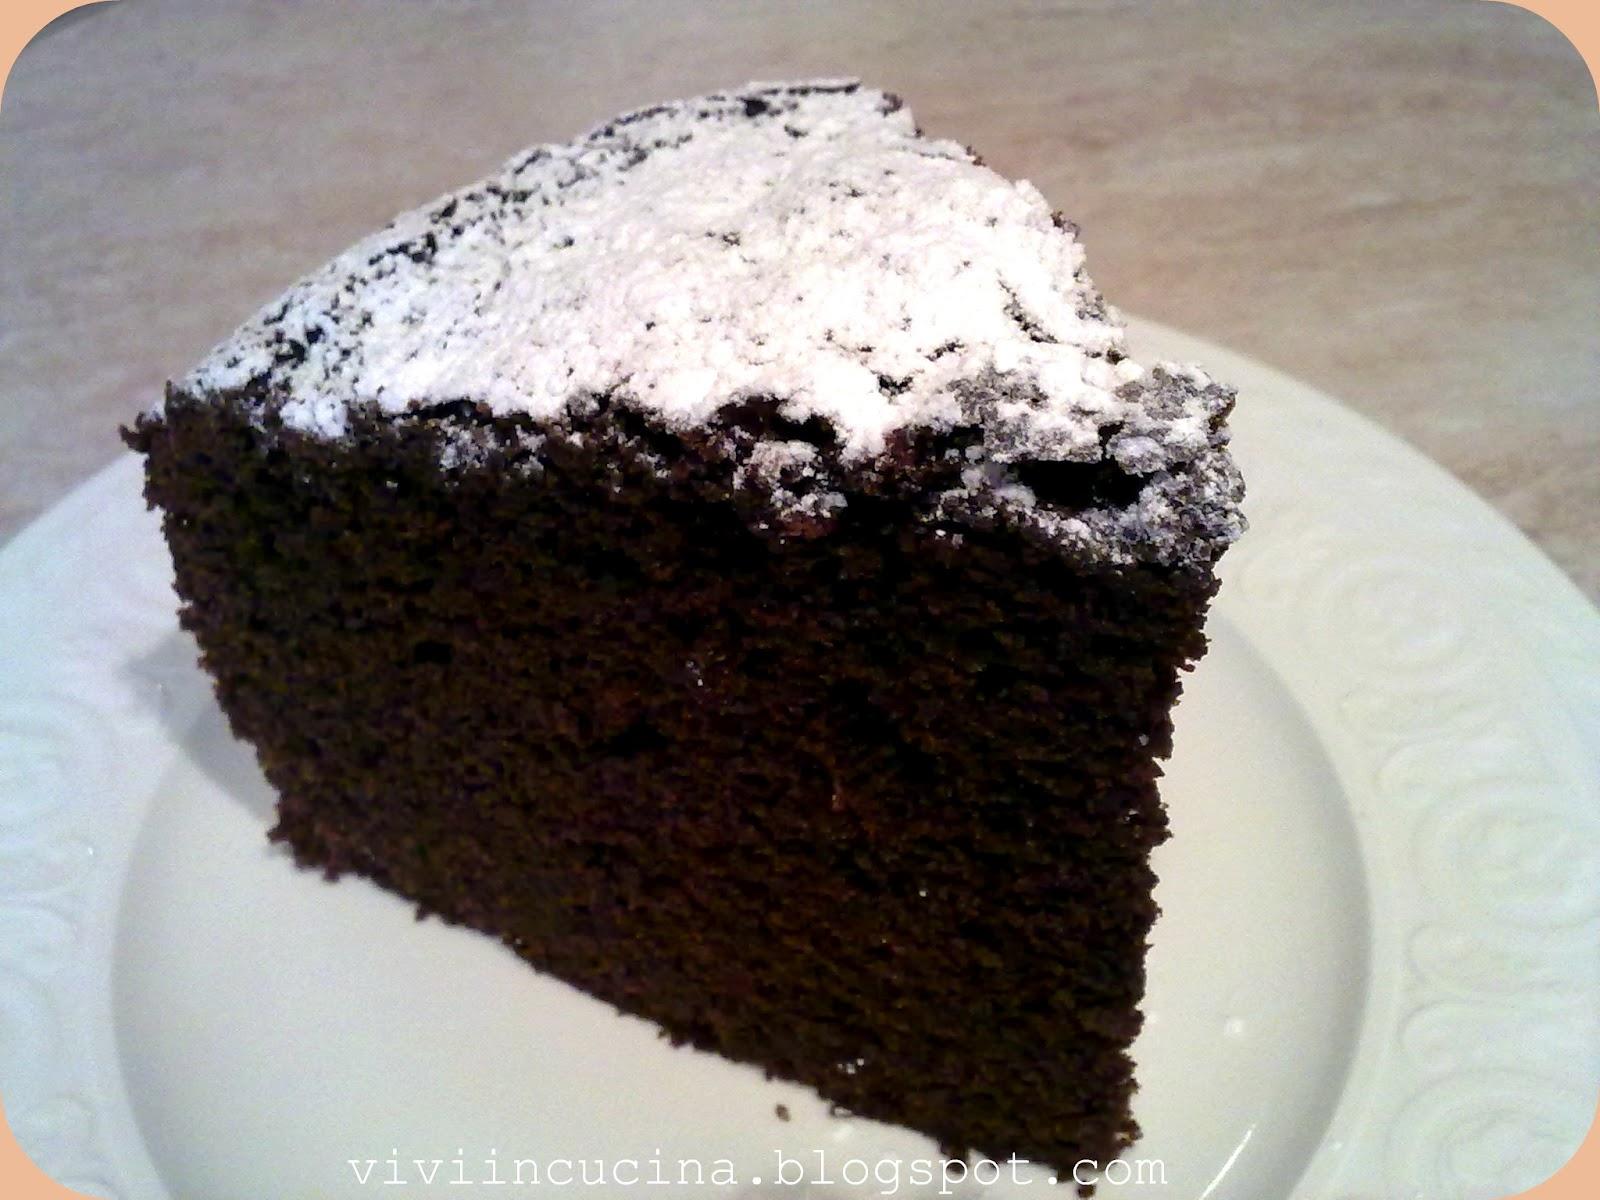 Vivi In Cucina Torta Al Cacao Soffice Soffice Bimby